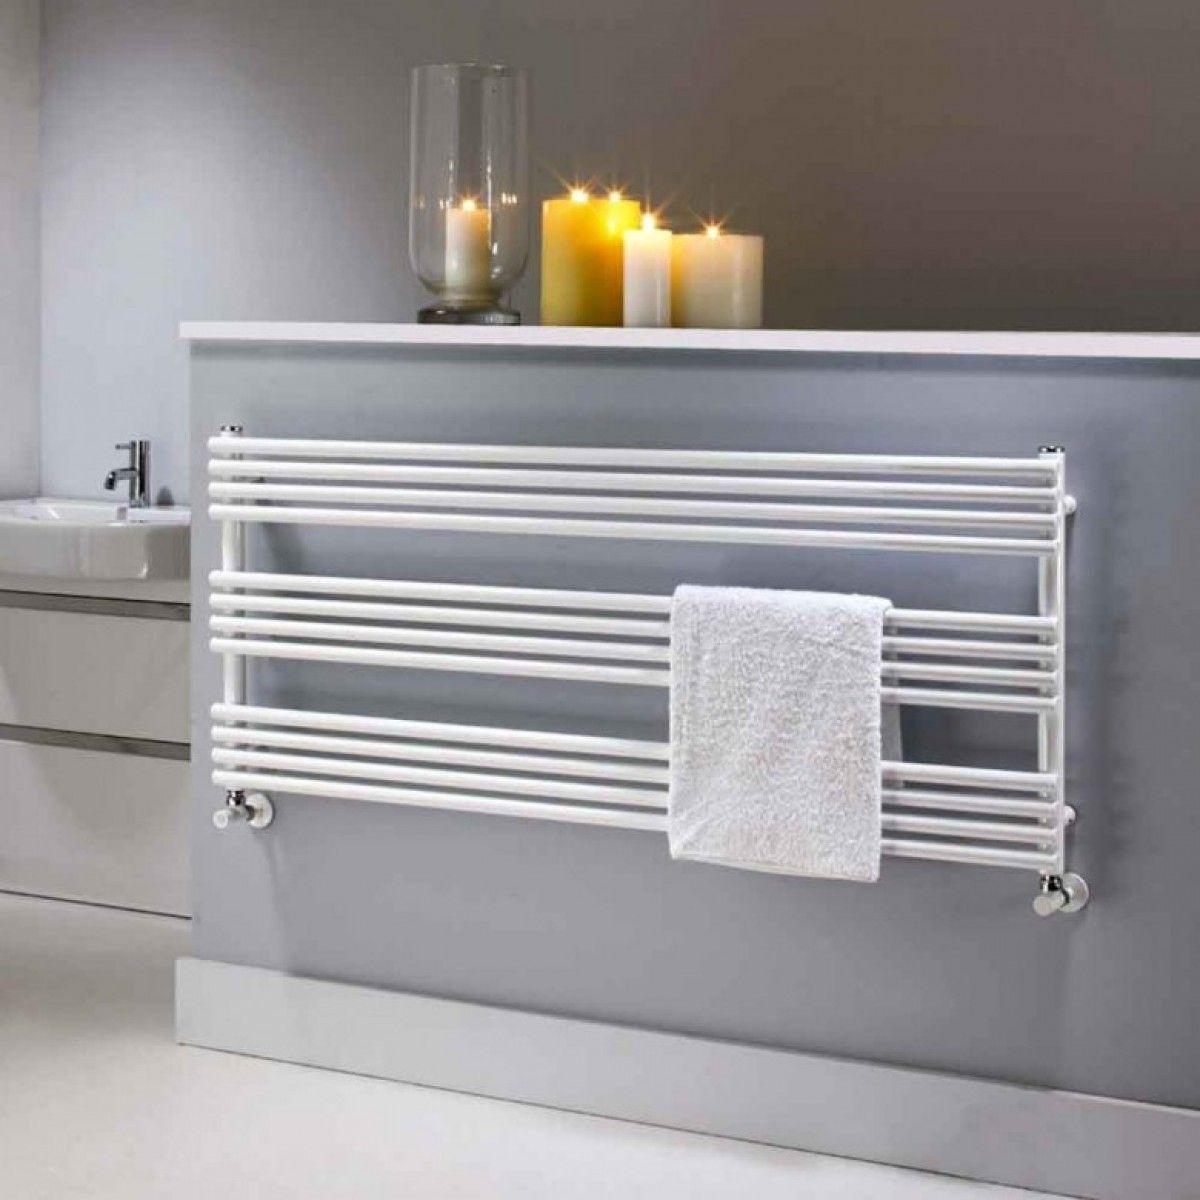 The Radiator Company Poll Bdo Designer Heated Towel White